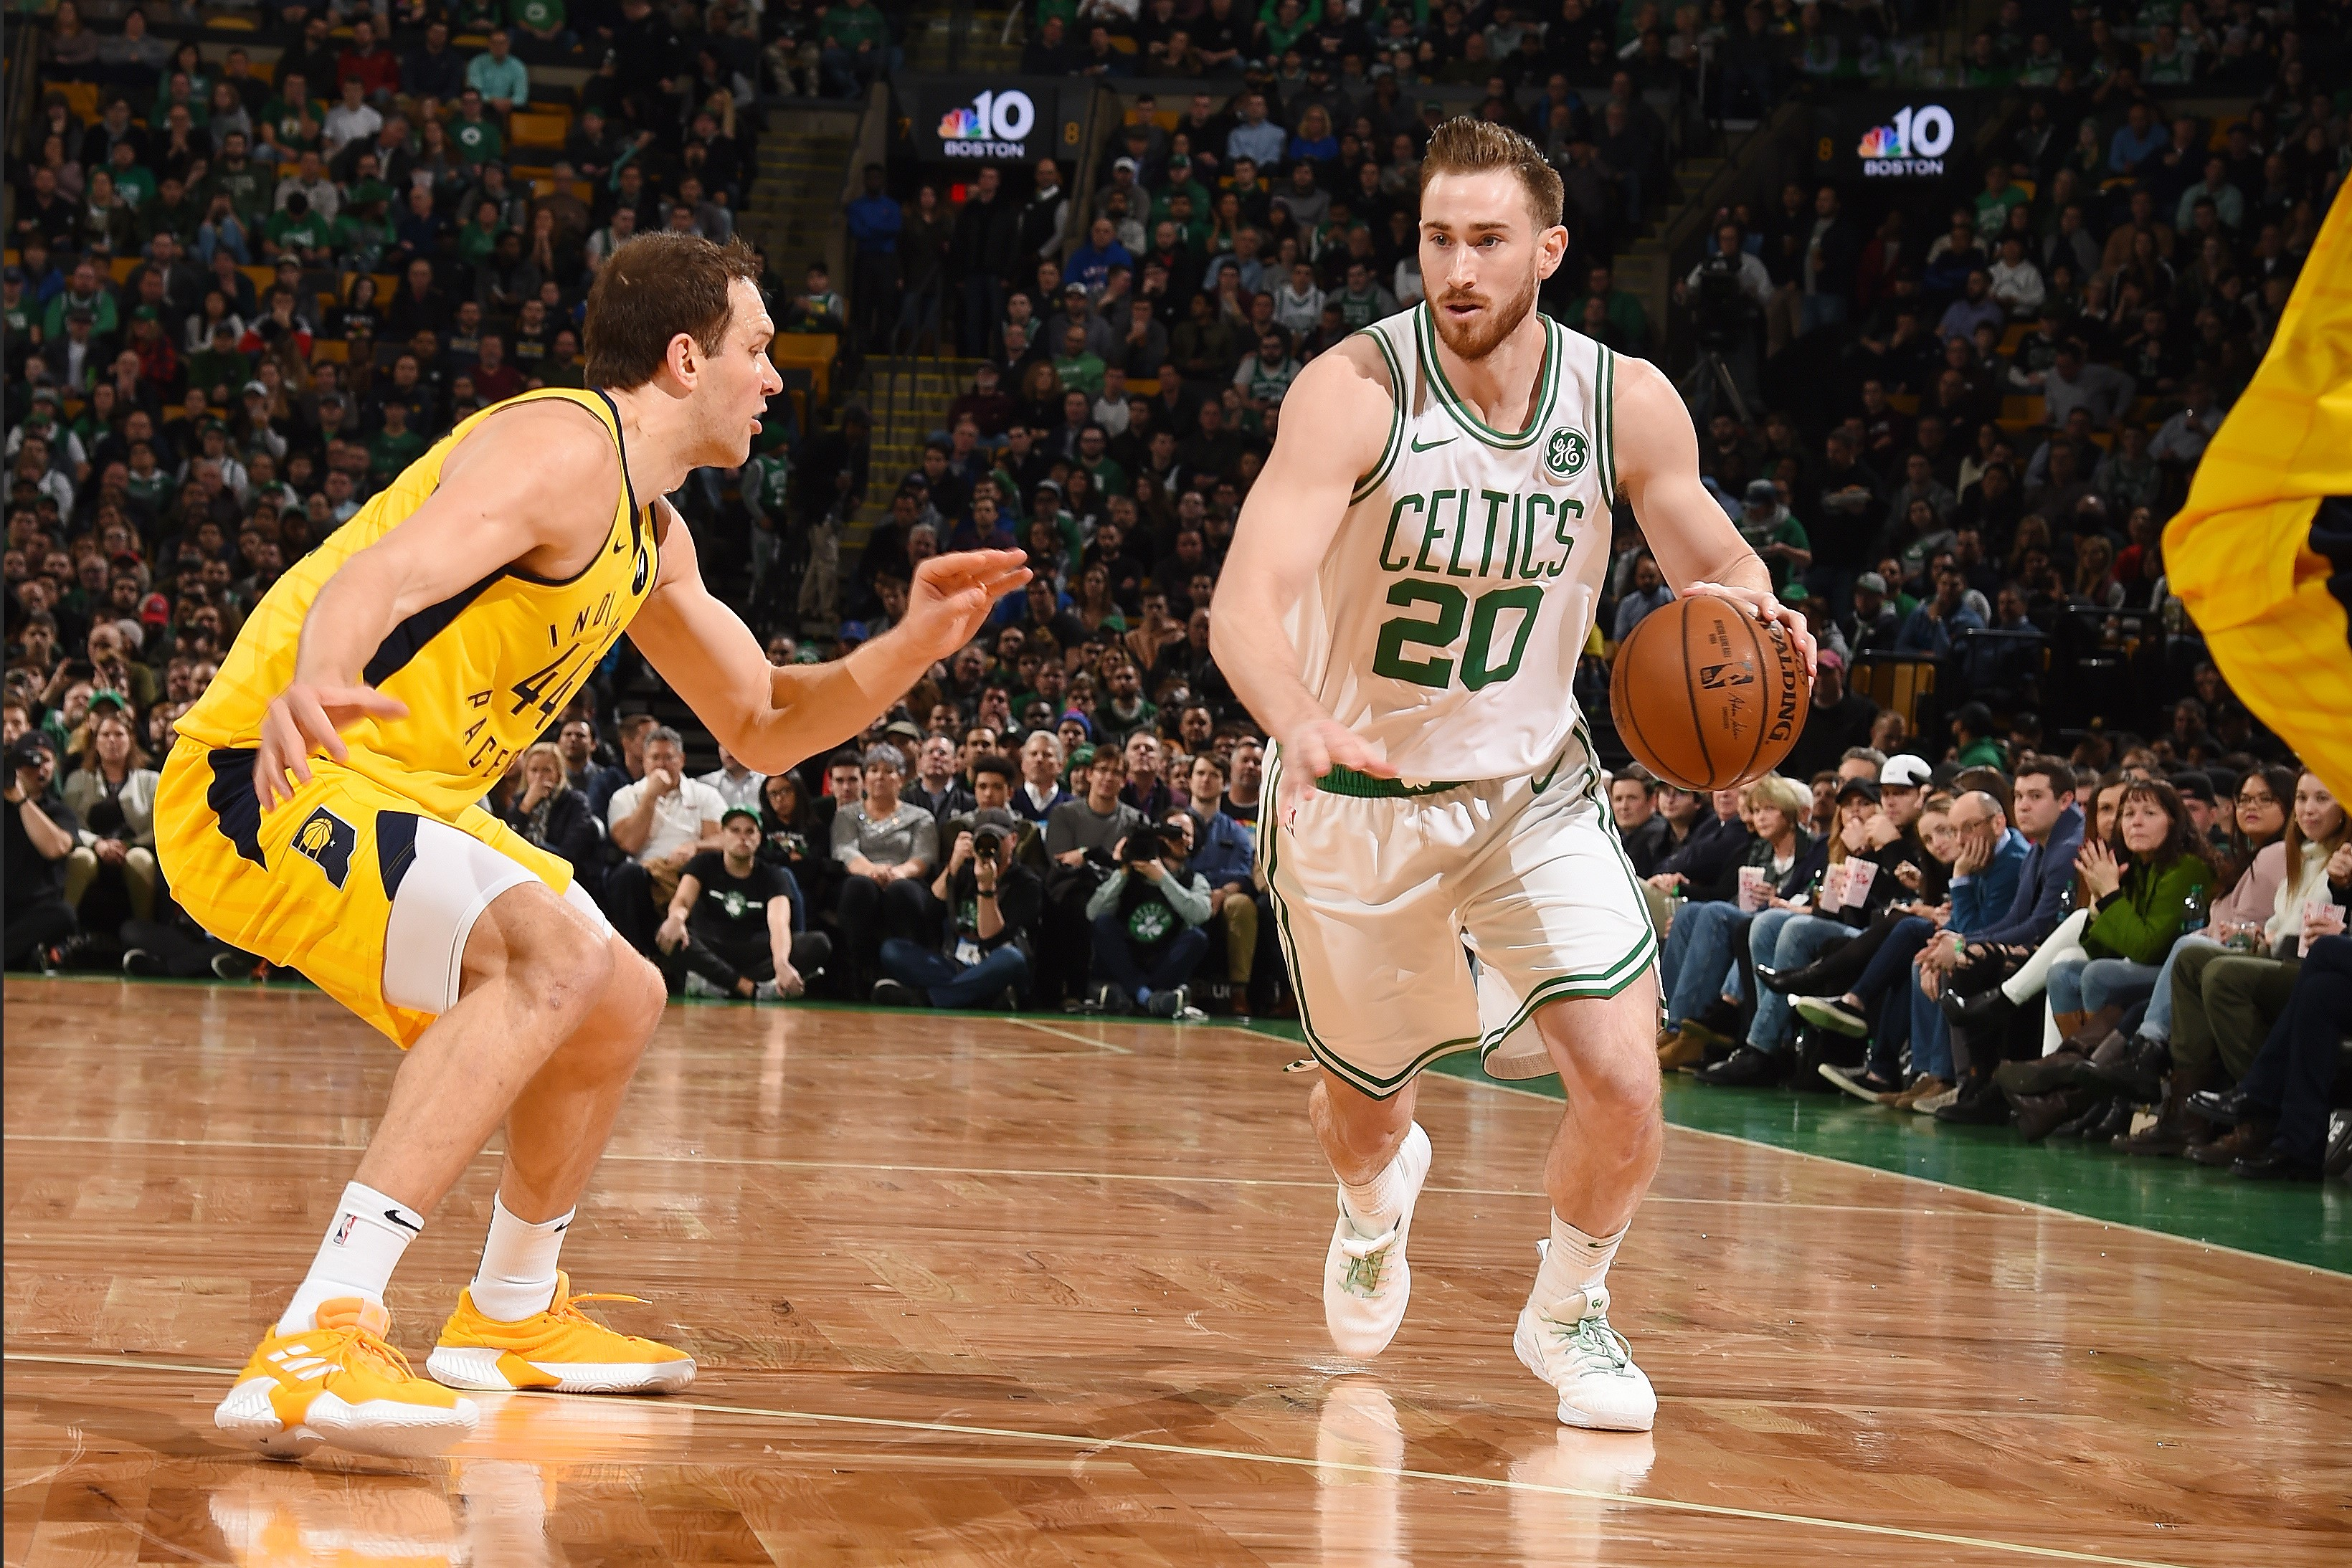 Gordon Hayward (Boston Celtics) vs Bojan Bogdanovic (Indiana Pacers)